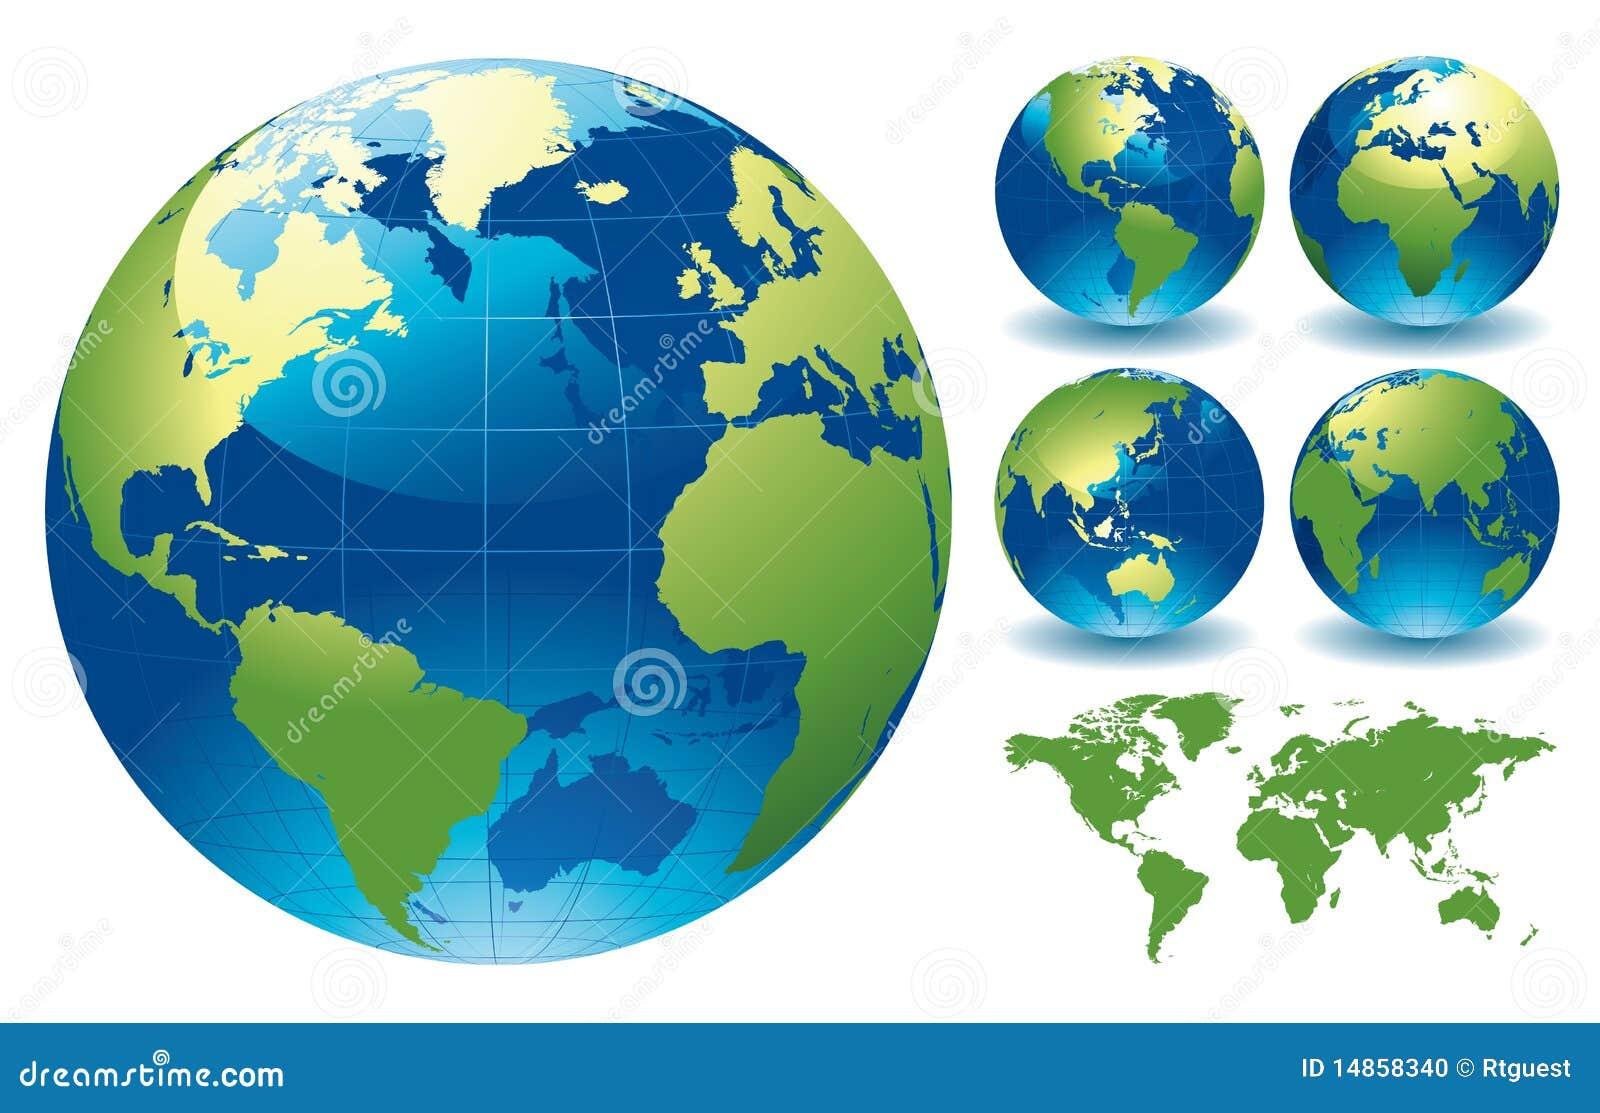 Kula ziemska kartografuje świat